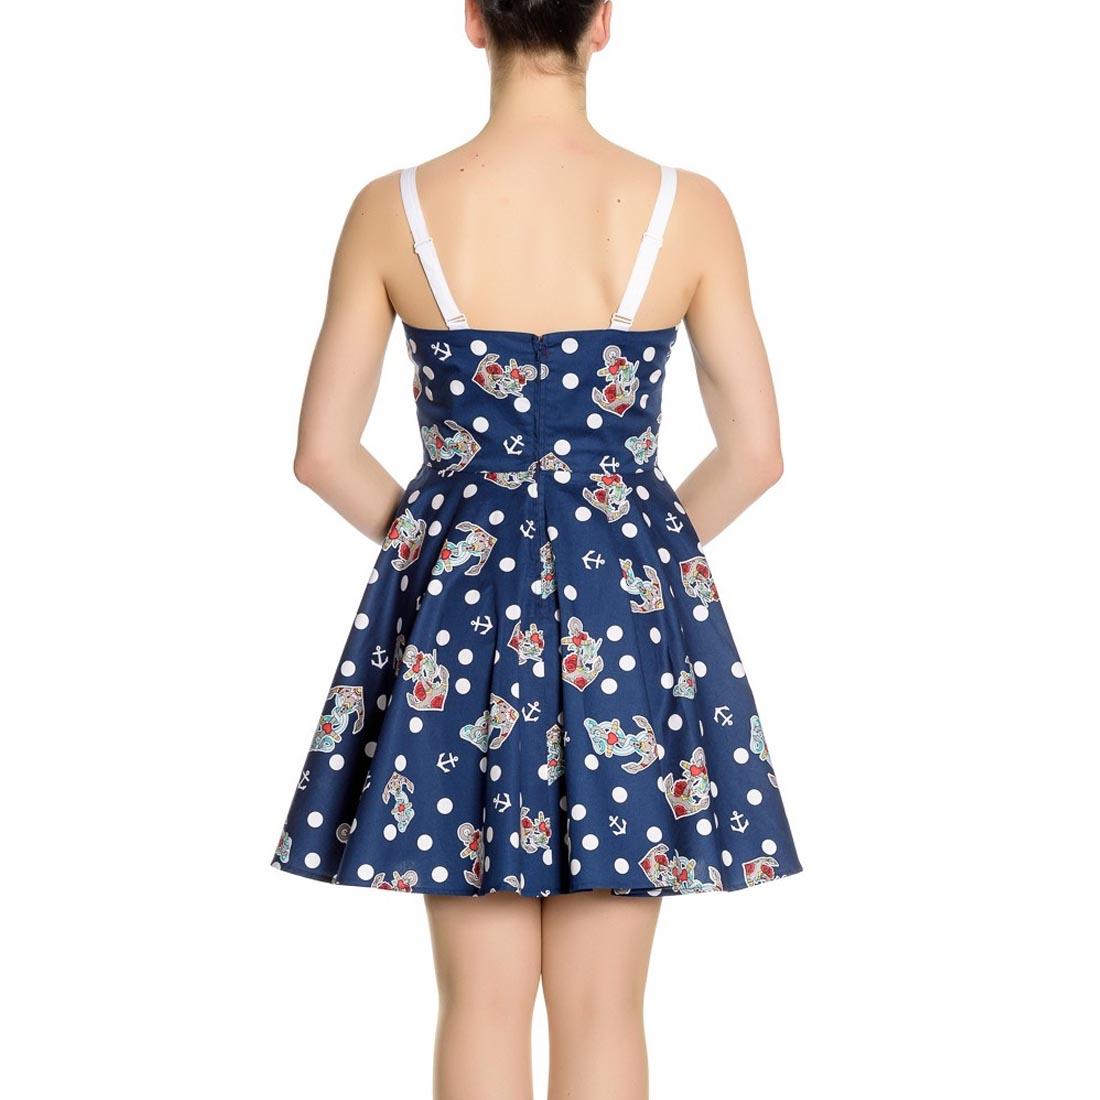 Hell-Bunny-Navy-Blue-50s-Nautical-Mini-Dress-OCEANA-Polka-Dot-All-Sizes thumbnail 9